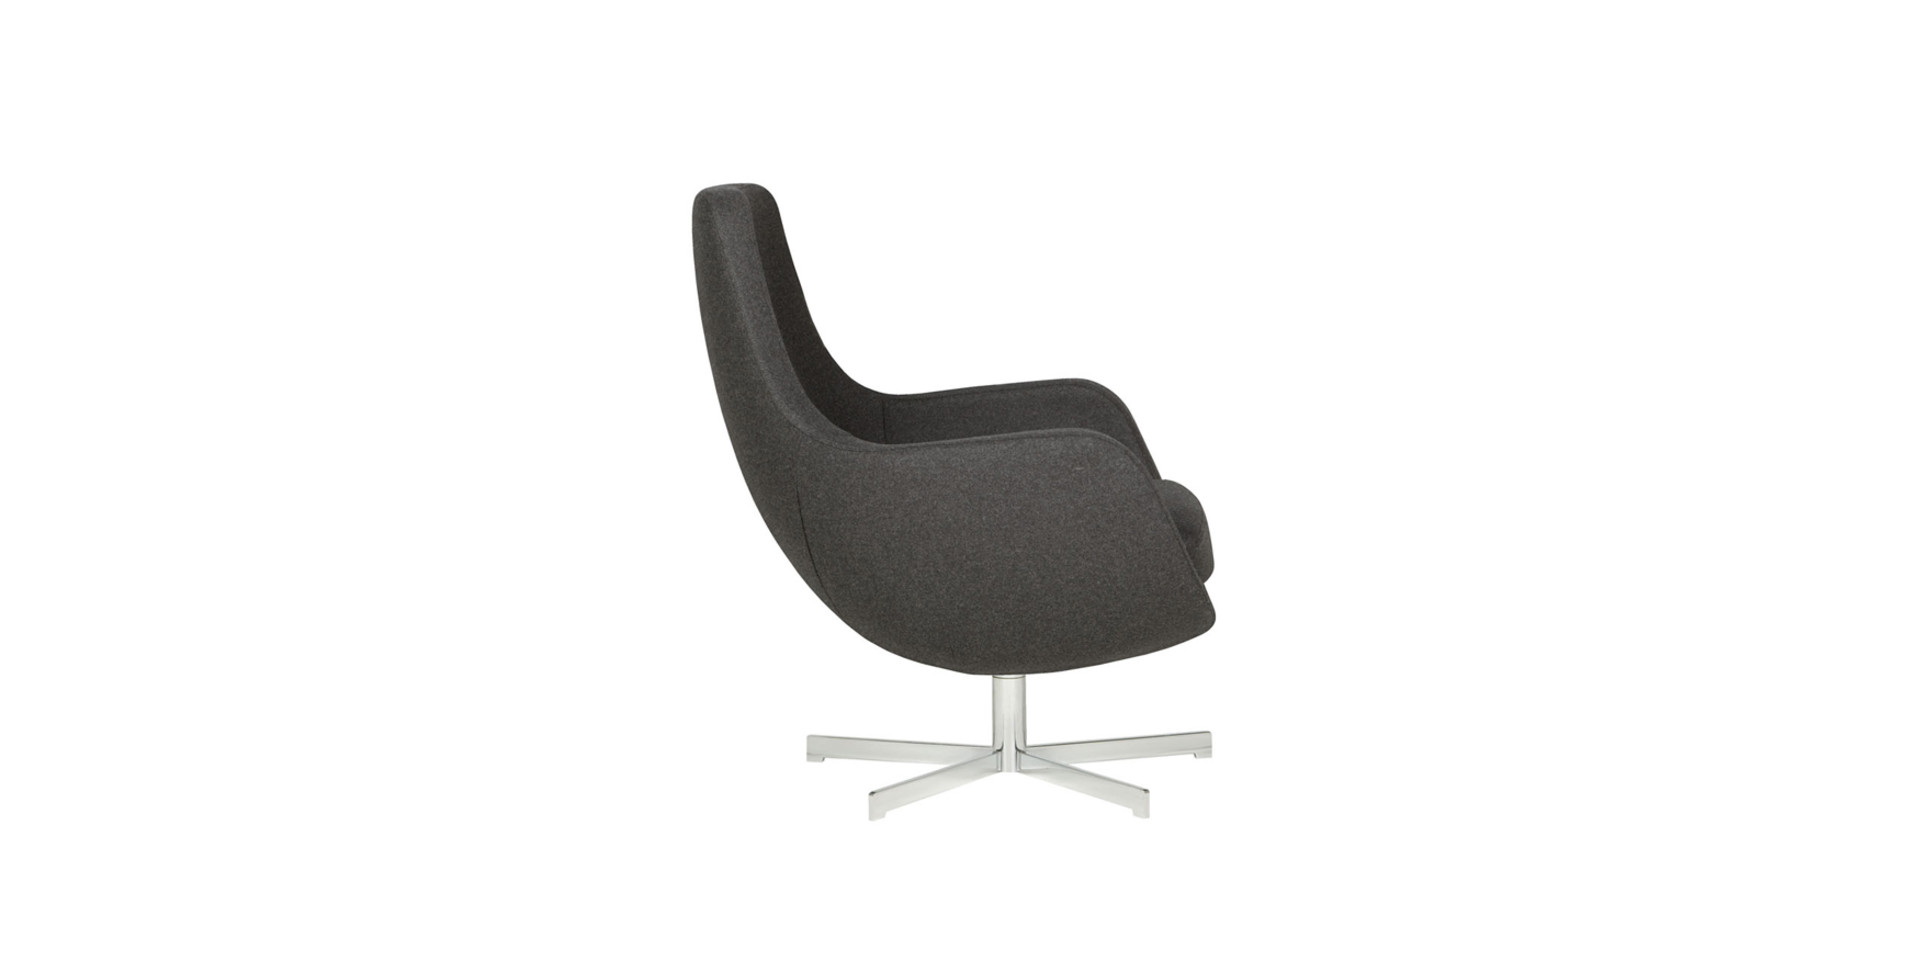 sits-stefani-fauteuil-armchair_swivel_panno1002_charcoal_3